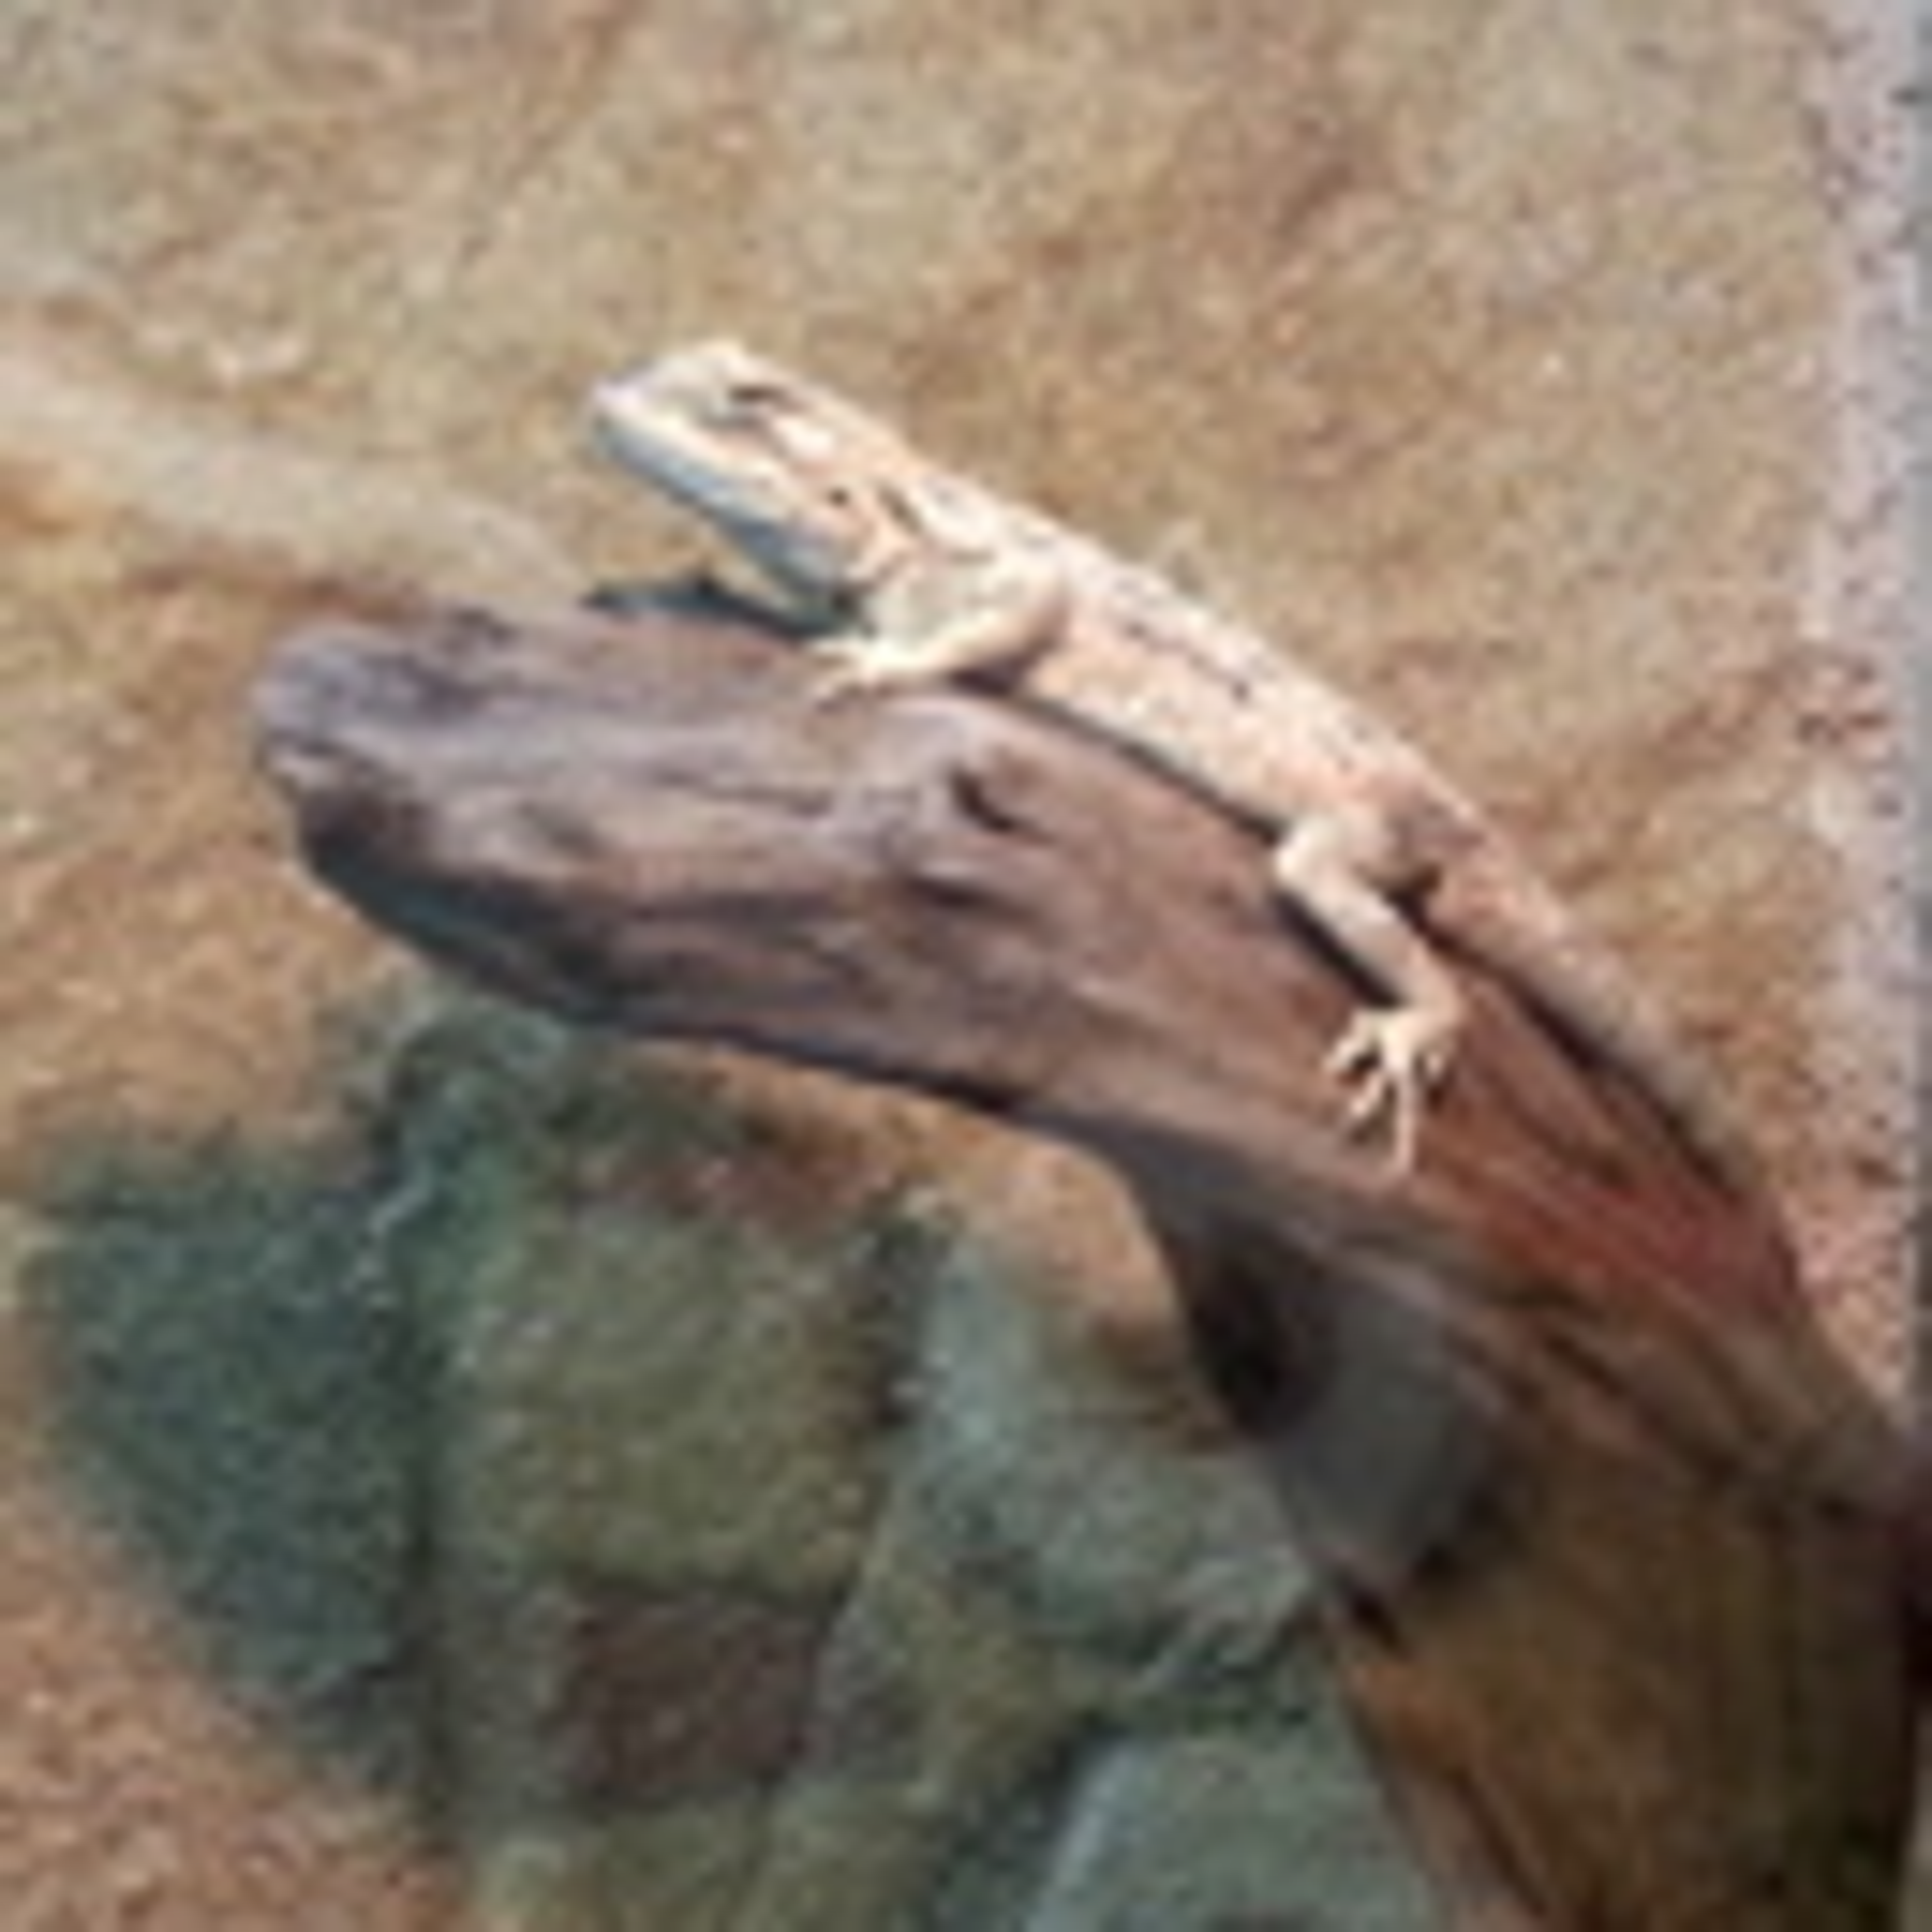 Animali - ZooGiardineria